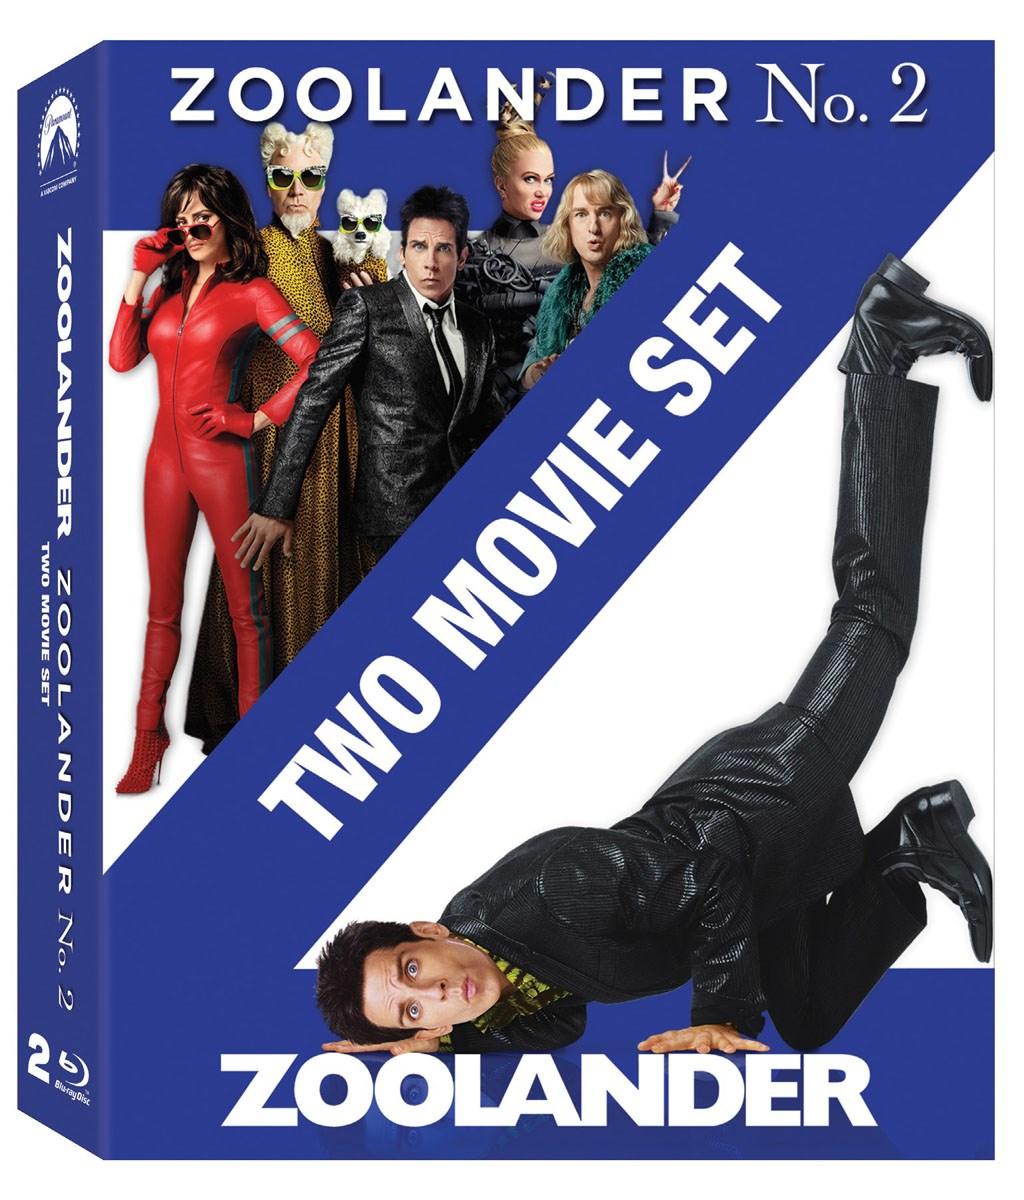 ZooLander 1 + 2 Doublepack Movies Blu-Ray Boxset £4.92 @ Zoom